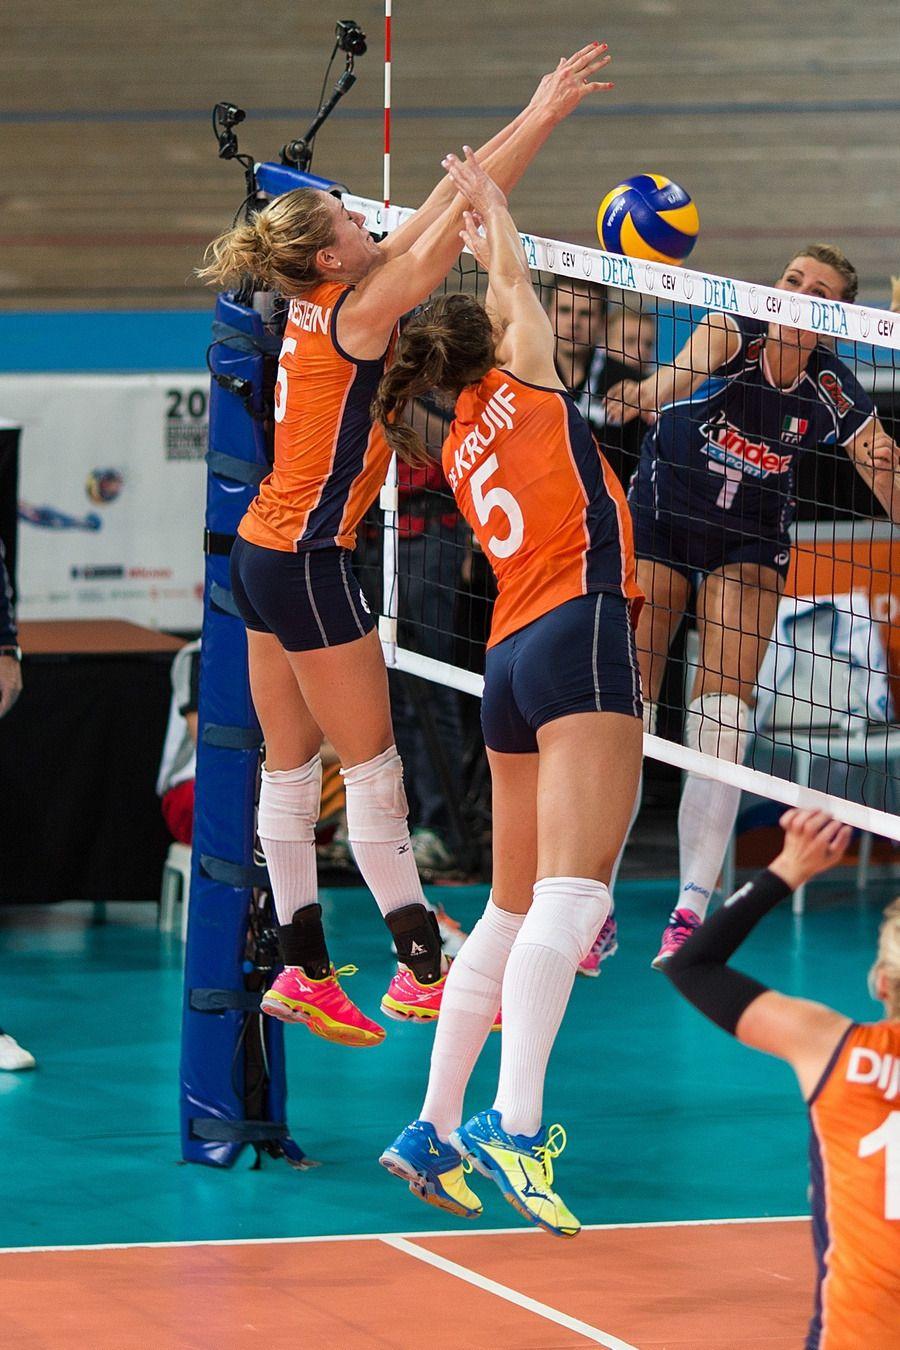 Maret Balkestein Grothues And Robin De Kruijf 2015 European Championship Voleibol Robin Deportes